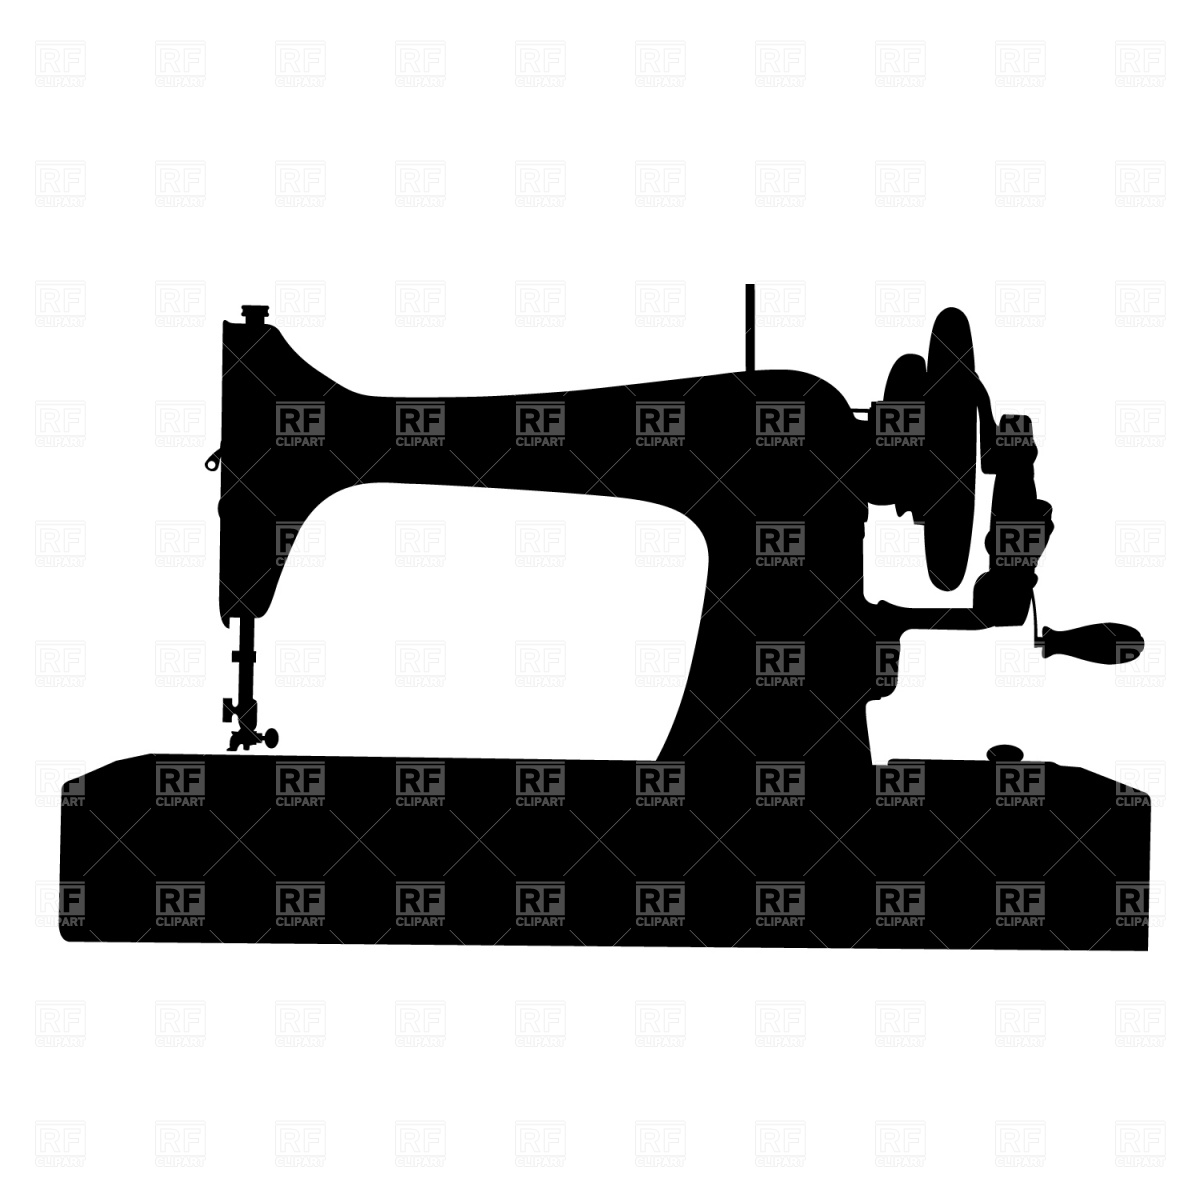 Retro sewing machine silhouette, 1468, Silhouettes, Outlines, download 1200 x 1200. Download. Sewing-machine ...